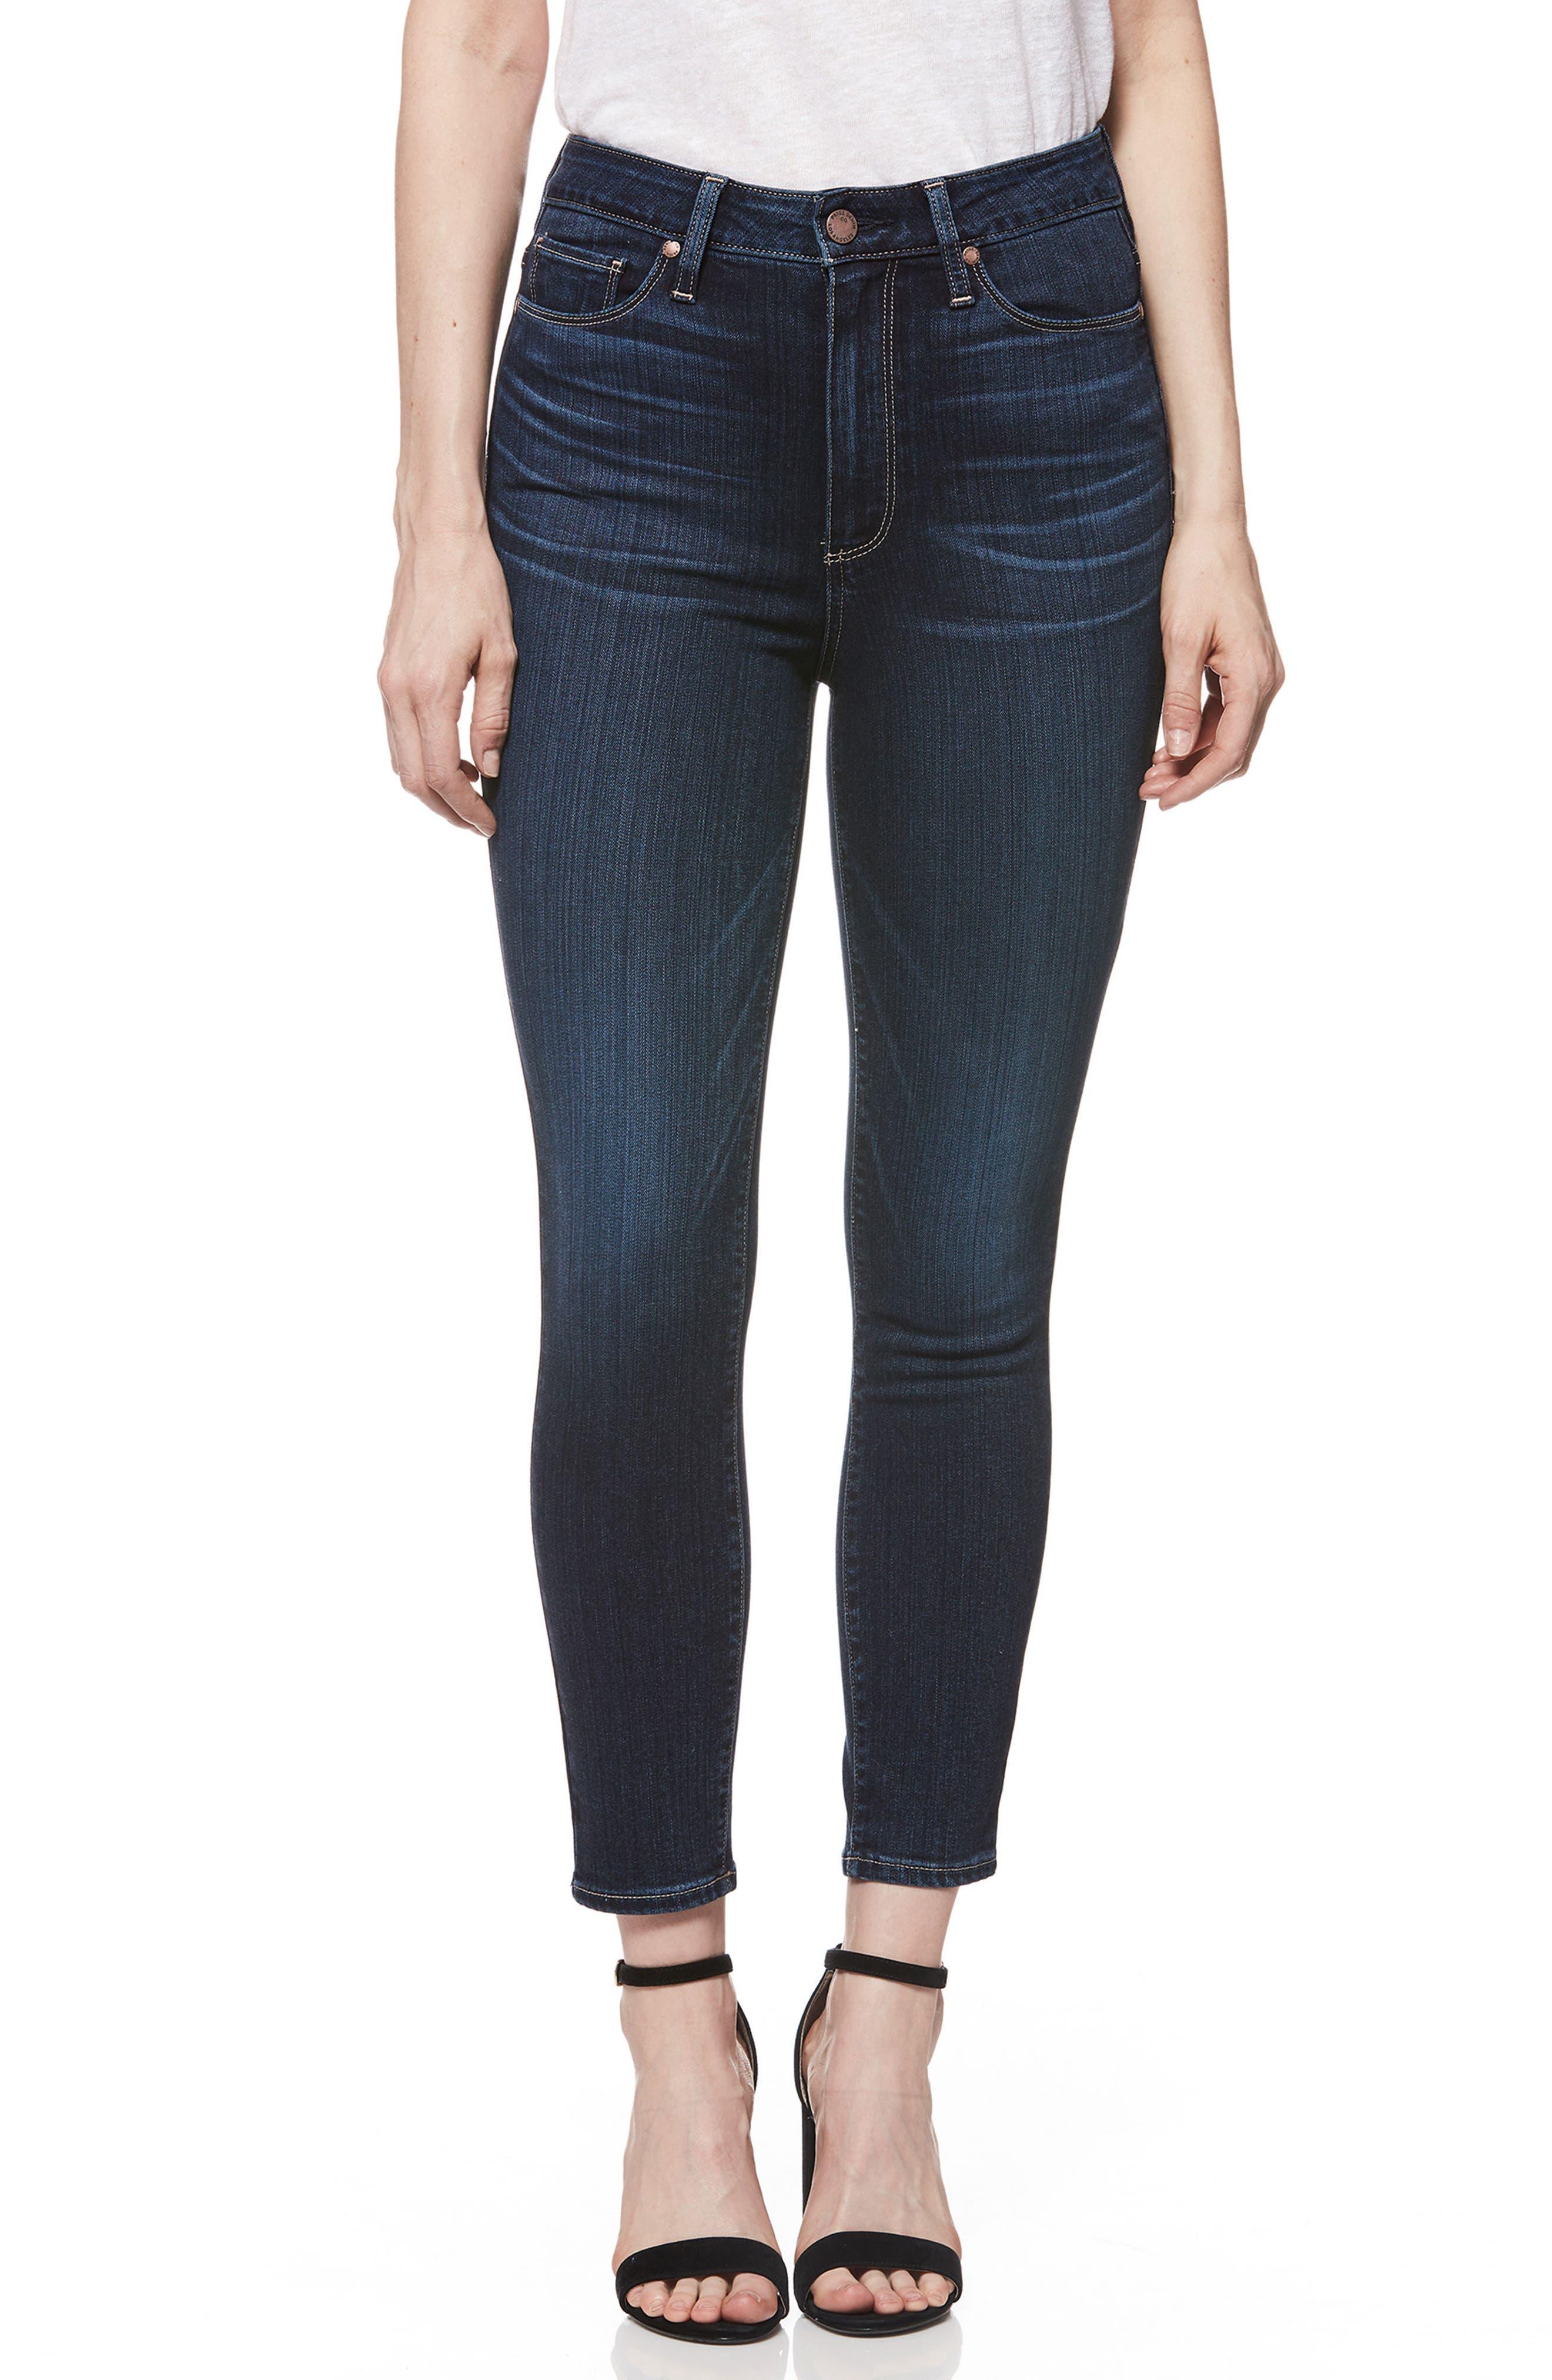 Transcend - Margot High Waist Crop Skinny Jeans,                             Main thumbnail 1, color,                             Sawtelle